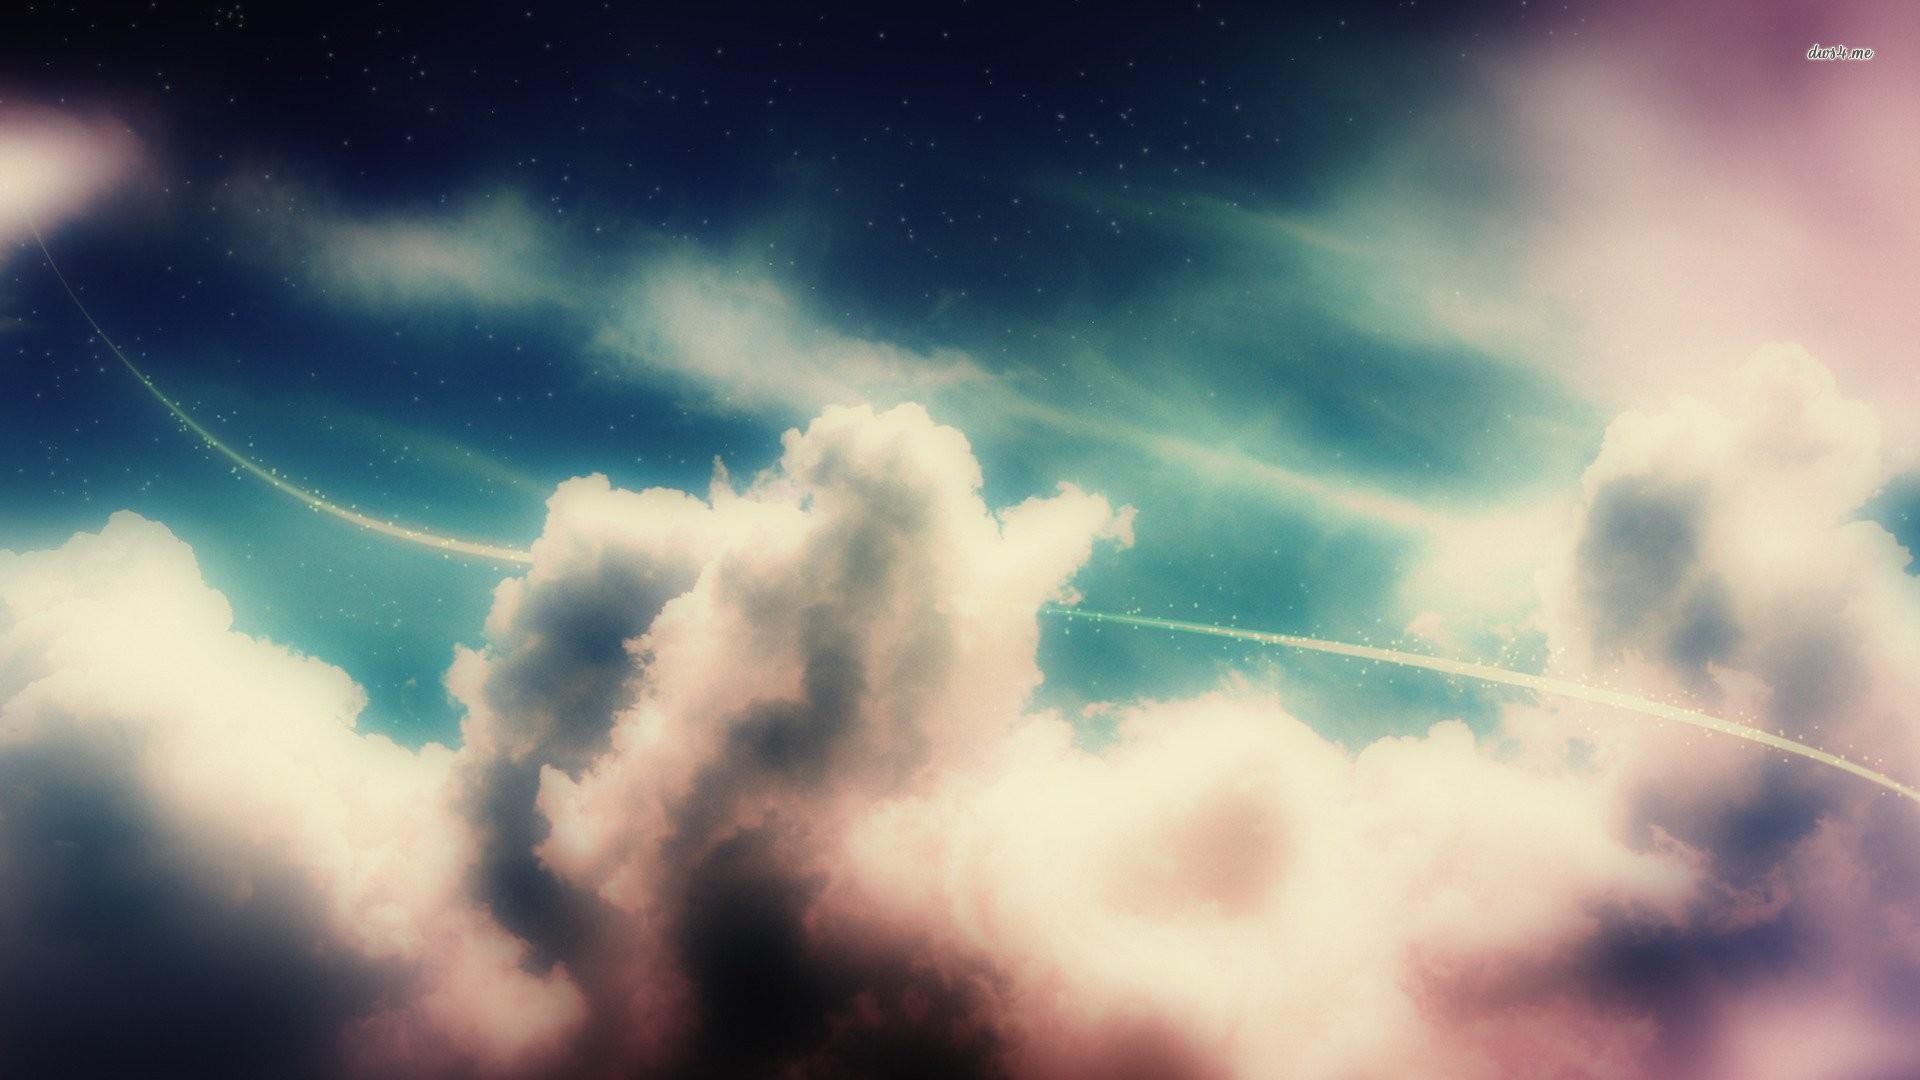 Heavenly 321695 · heavenly sword 183404